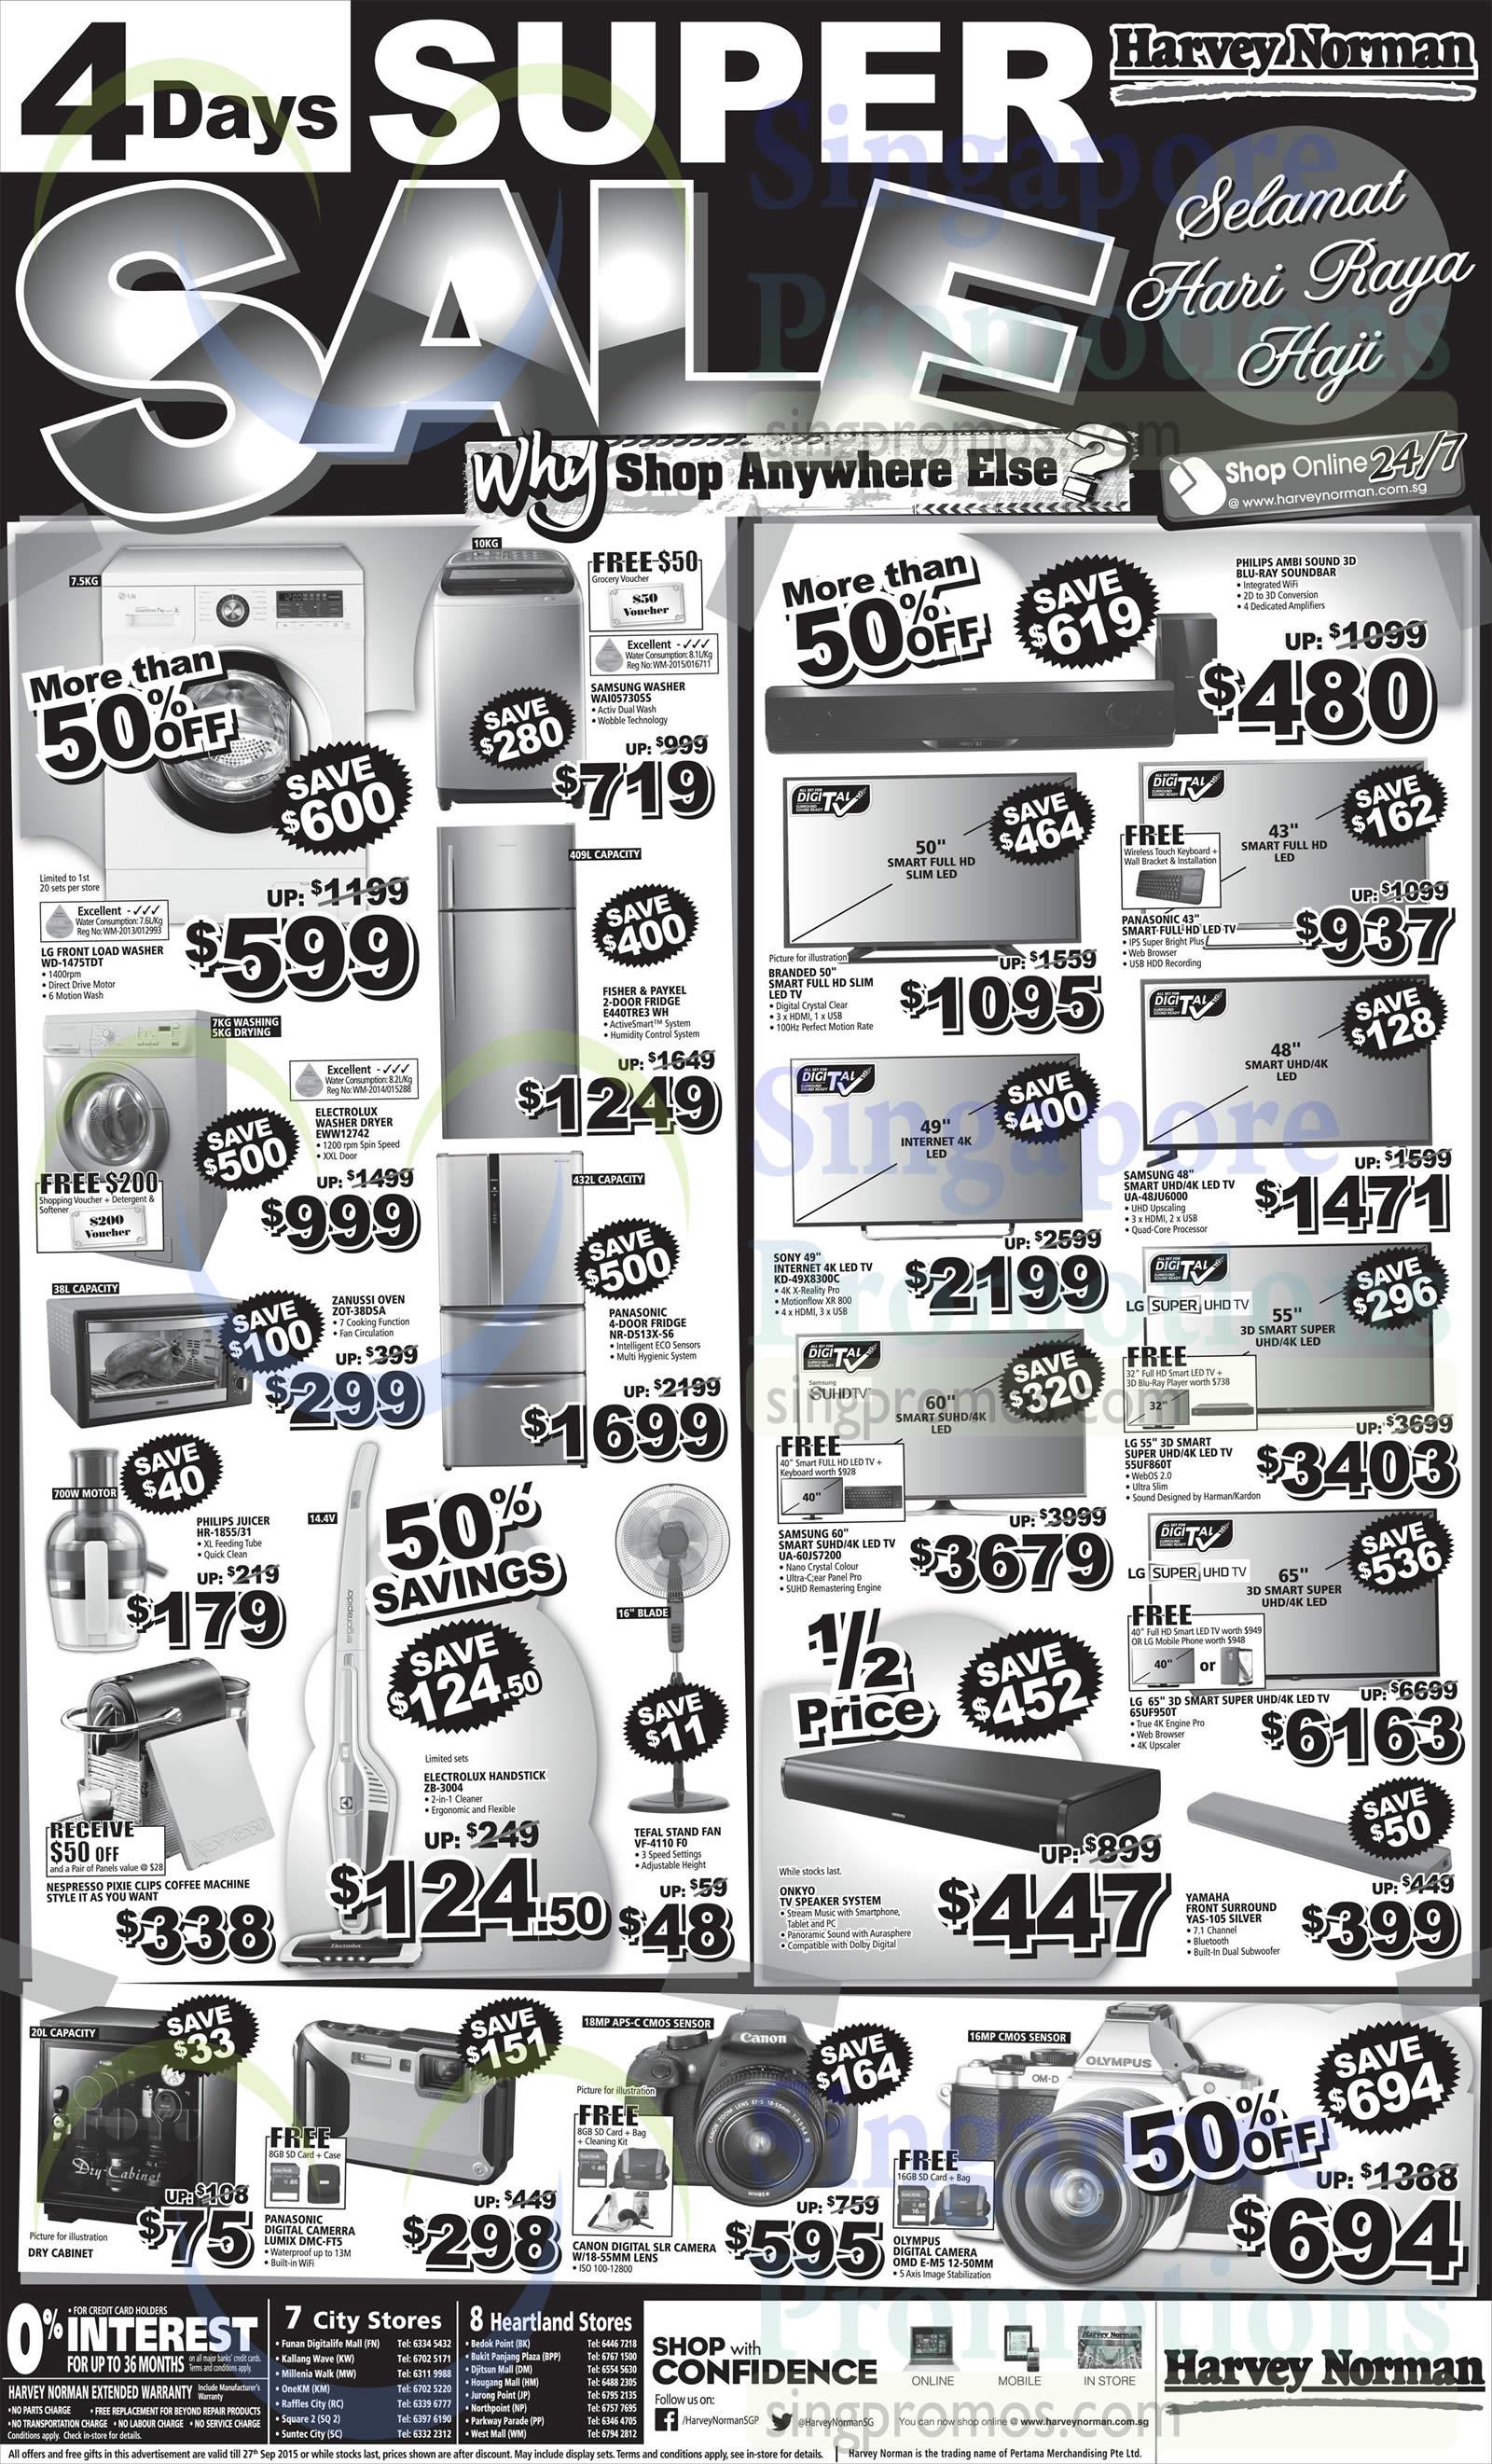 LG WD-1475TDT Washer, Samsung WAI05730SS Washer, Fisher & Paykel E440TRE3 WH Fridge, Panasonic NR-D513X-S6 Fridge, Electrolux EWW12742 Washer, Zanussi ZOT-38DSA Oven, Philips HR-1855/31 Juicer, Nespresso Pixie Clips Coffee Machine, Electrolux ZB-3004 Vacuum Cleaner, Tefa VF-4110 F0 Fan, Sony KD-49X8300C TV, Samsung UA60JS7200 TV, Samsung UA-48JU6000 TV, LG 55UF860T TV, LG 65UF950T TV, Yamaha YAS-105 Speaker, Panasonic Lumix DMC-FT5 Digital Camera and Olympus OMD E-M5 Digital Camera